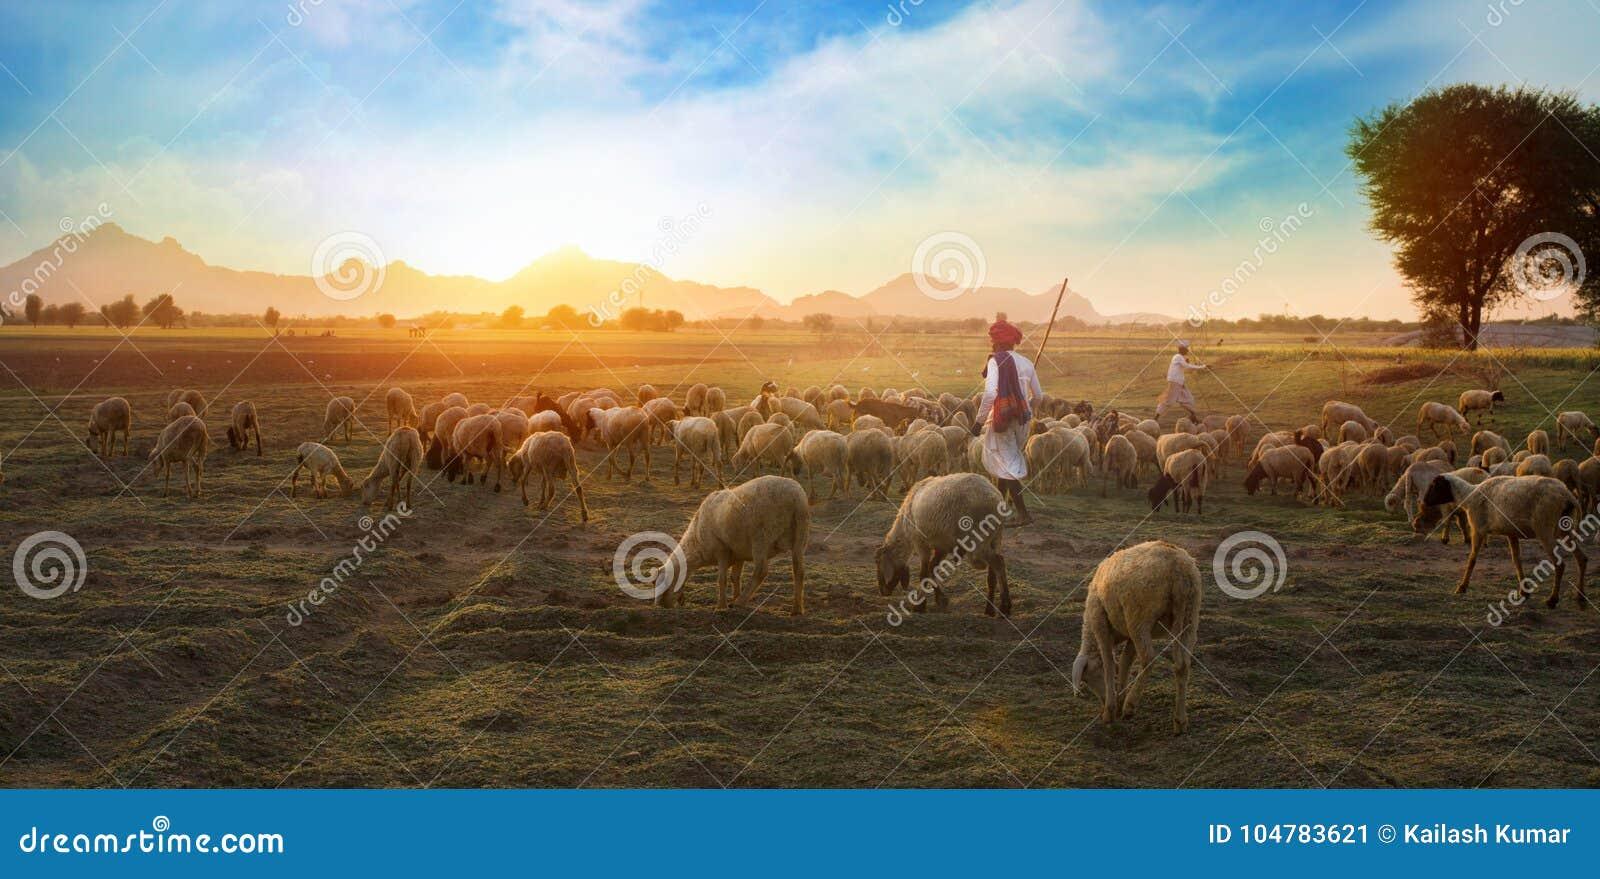 Download Rural Herding editorial photo. Image of animal, herder - 104783621